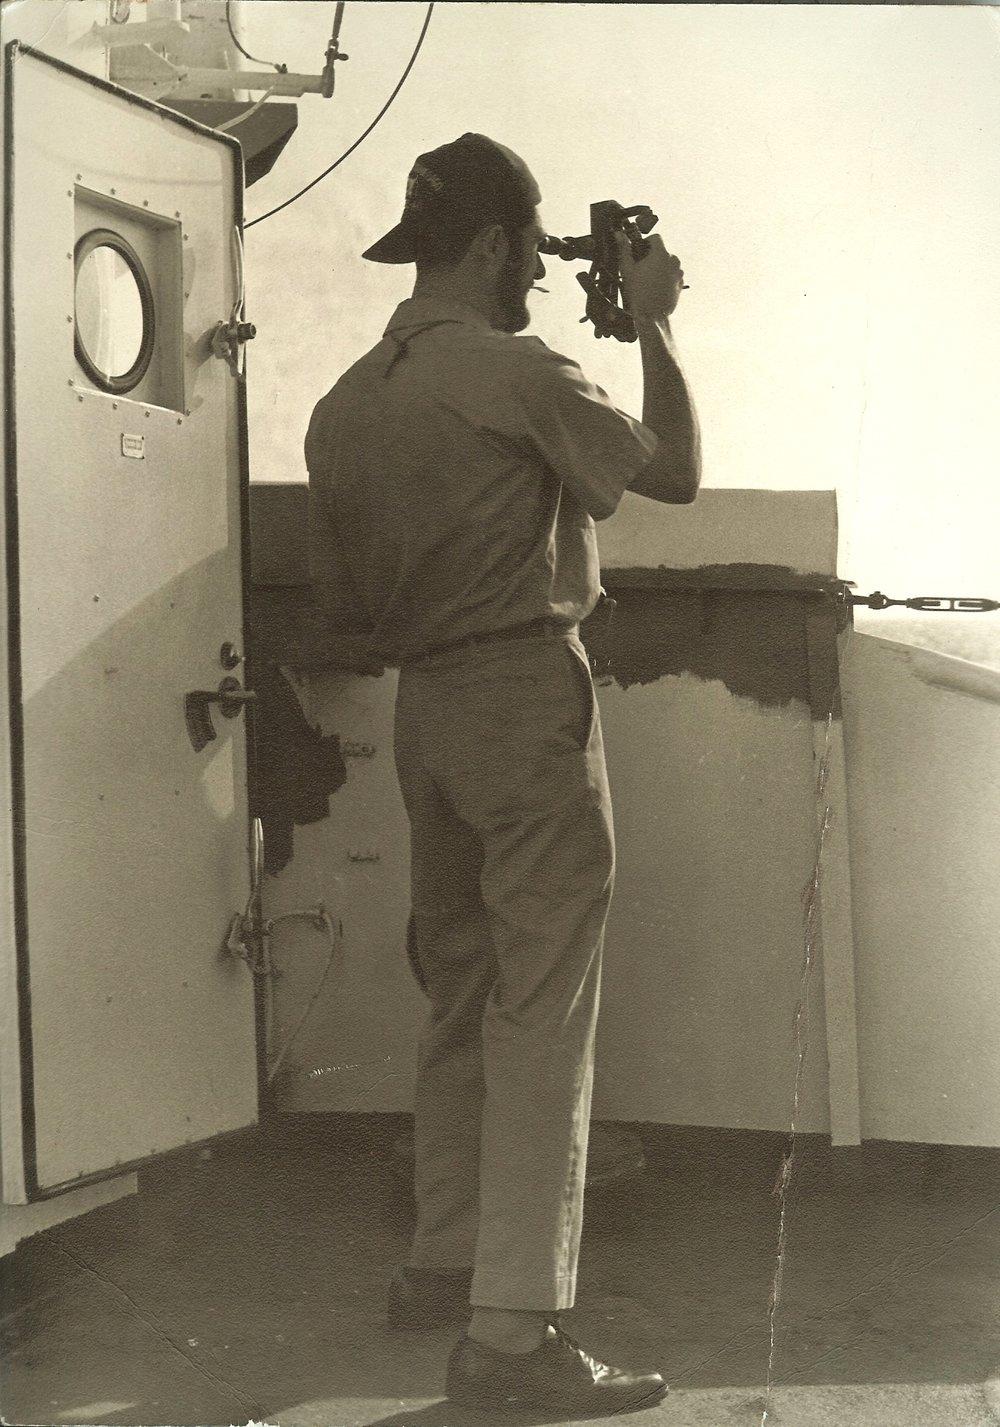 Search and Rescue: John's 5513 Sub